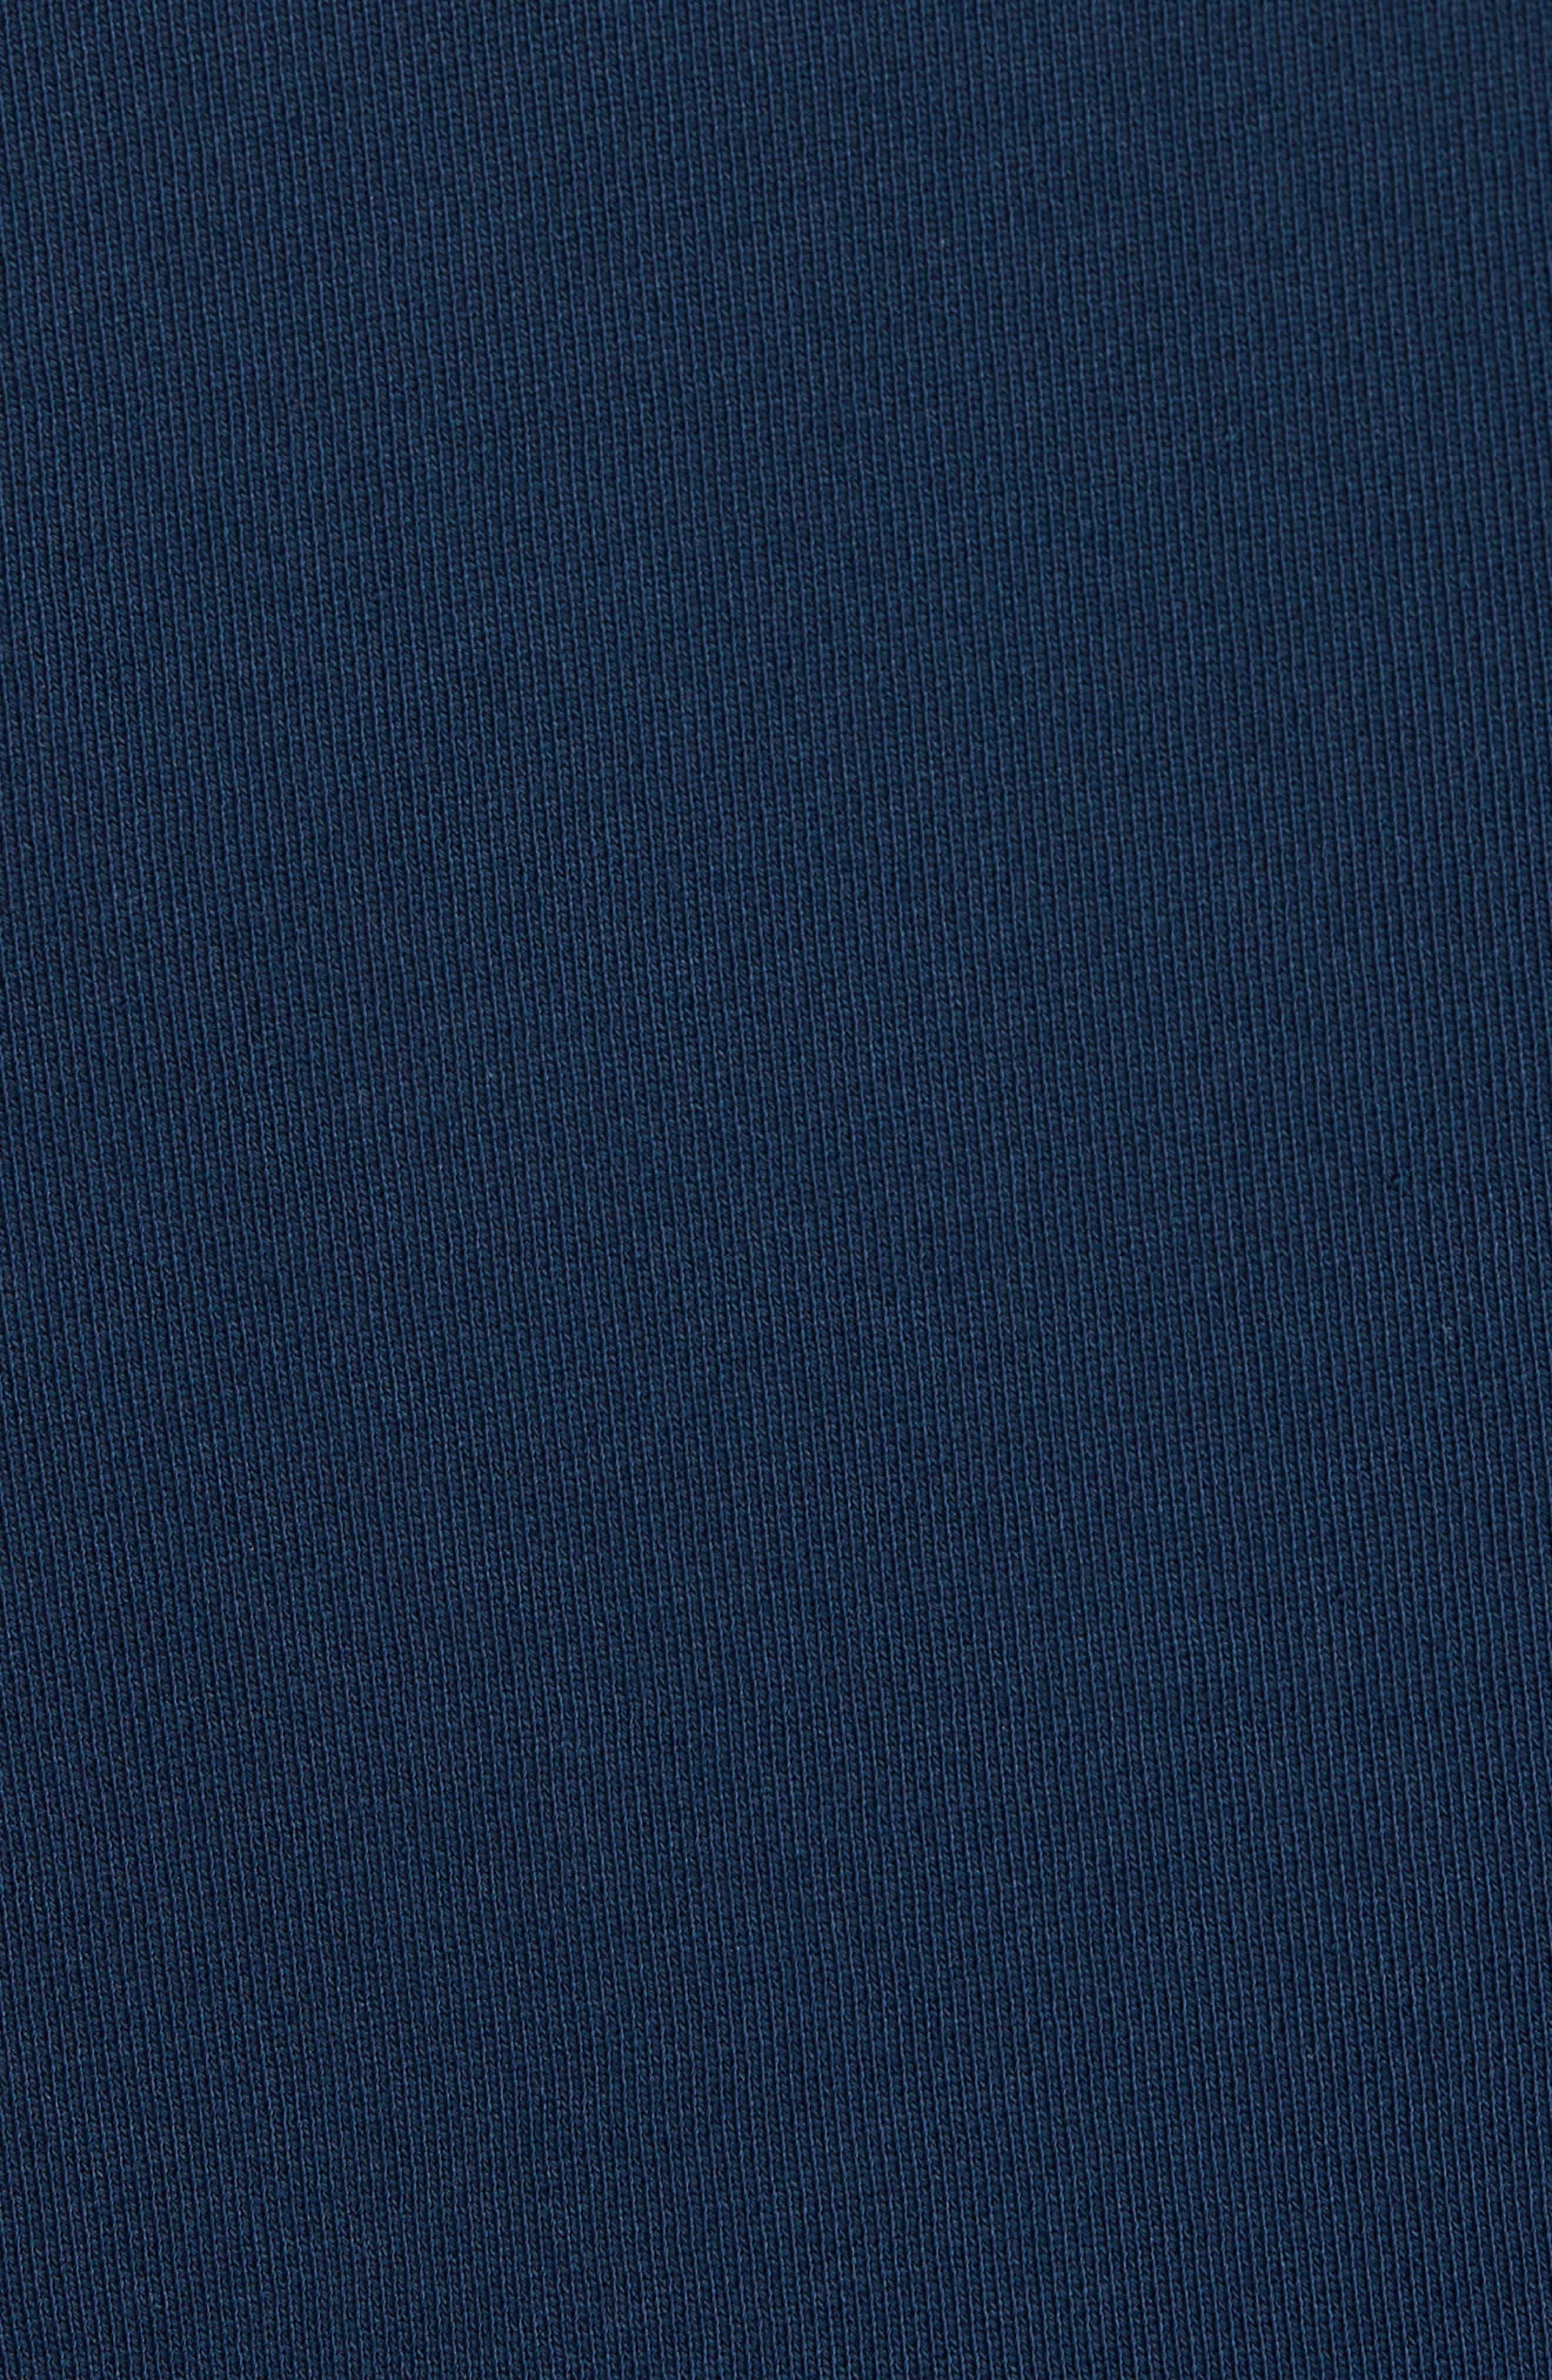 Alternate Image 5  - Original Paperbacks South Sea Raglan Sweatshirt